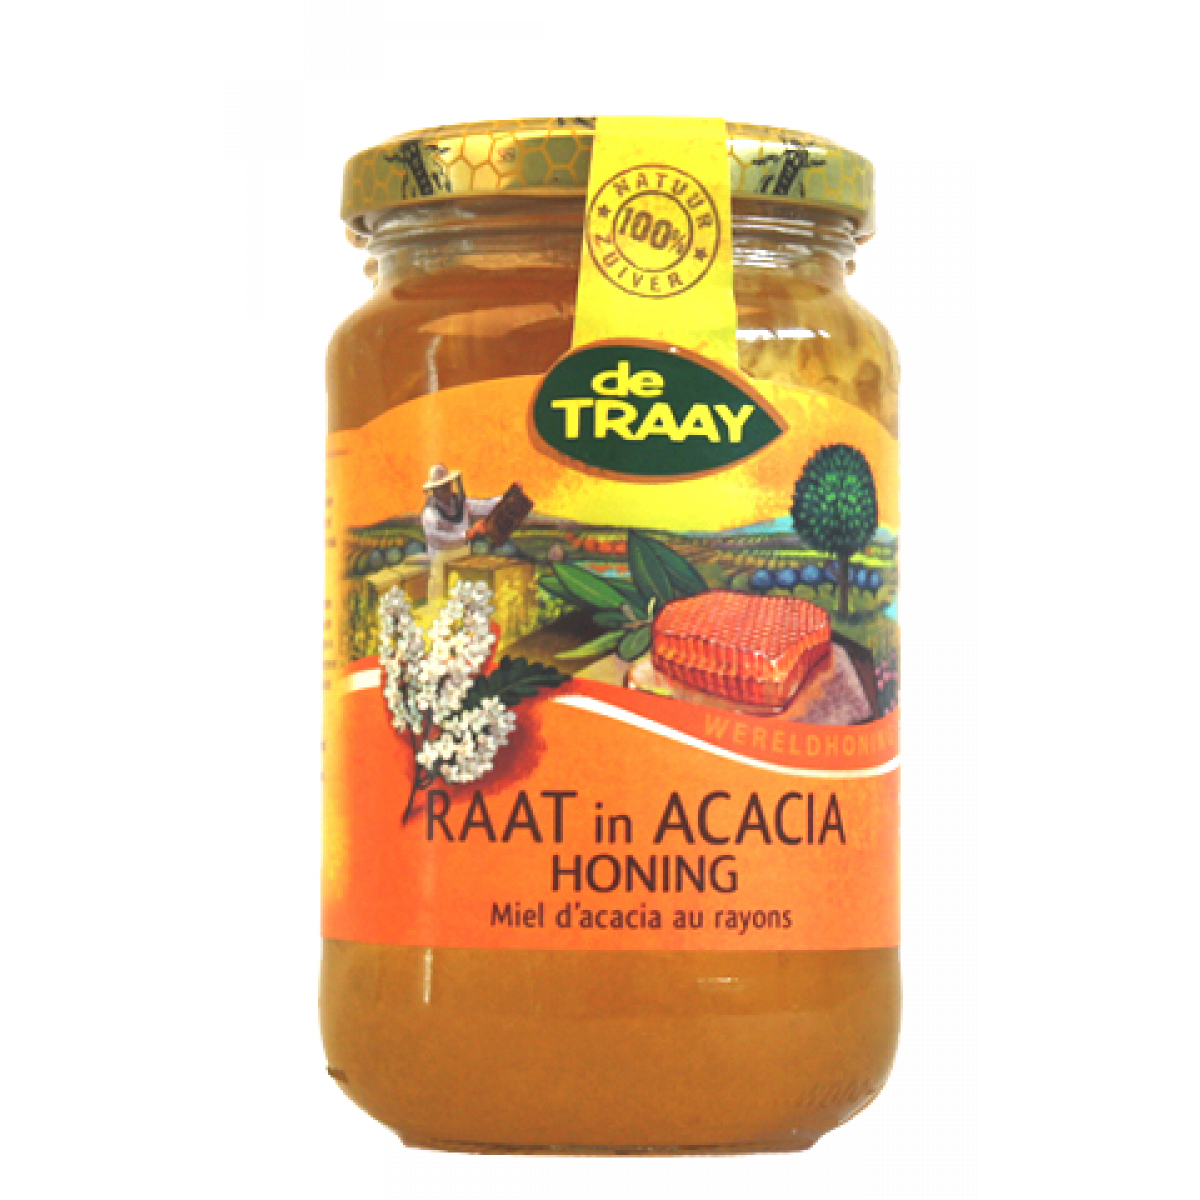 Raat In Acacia Honing